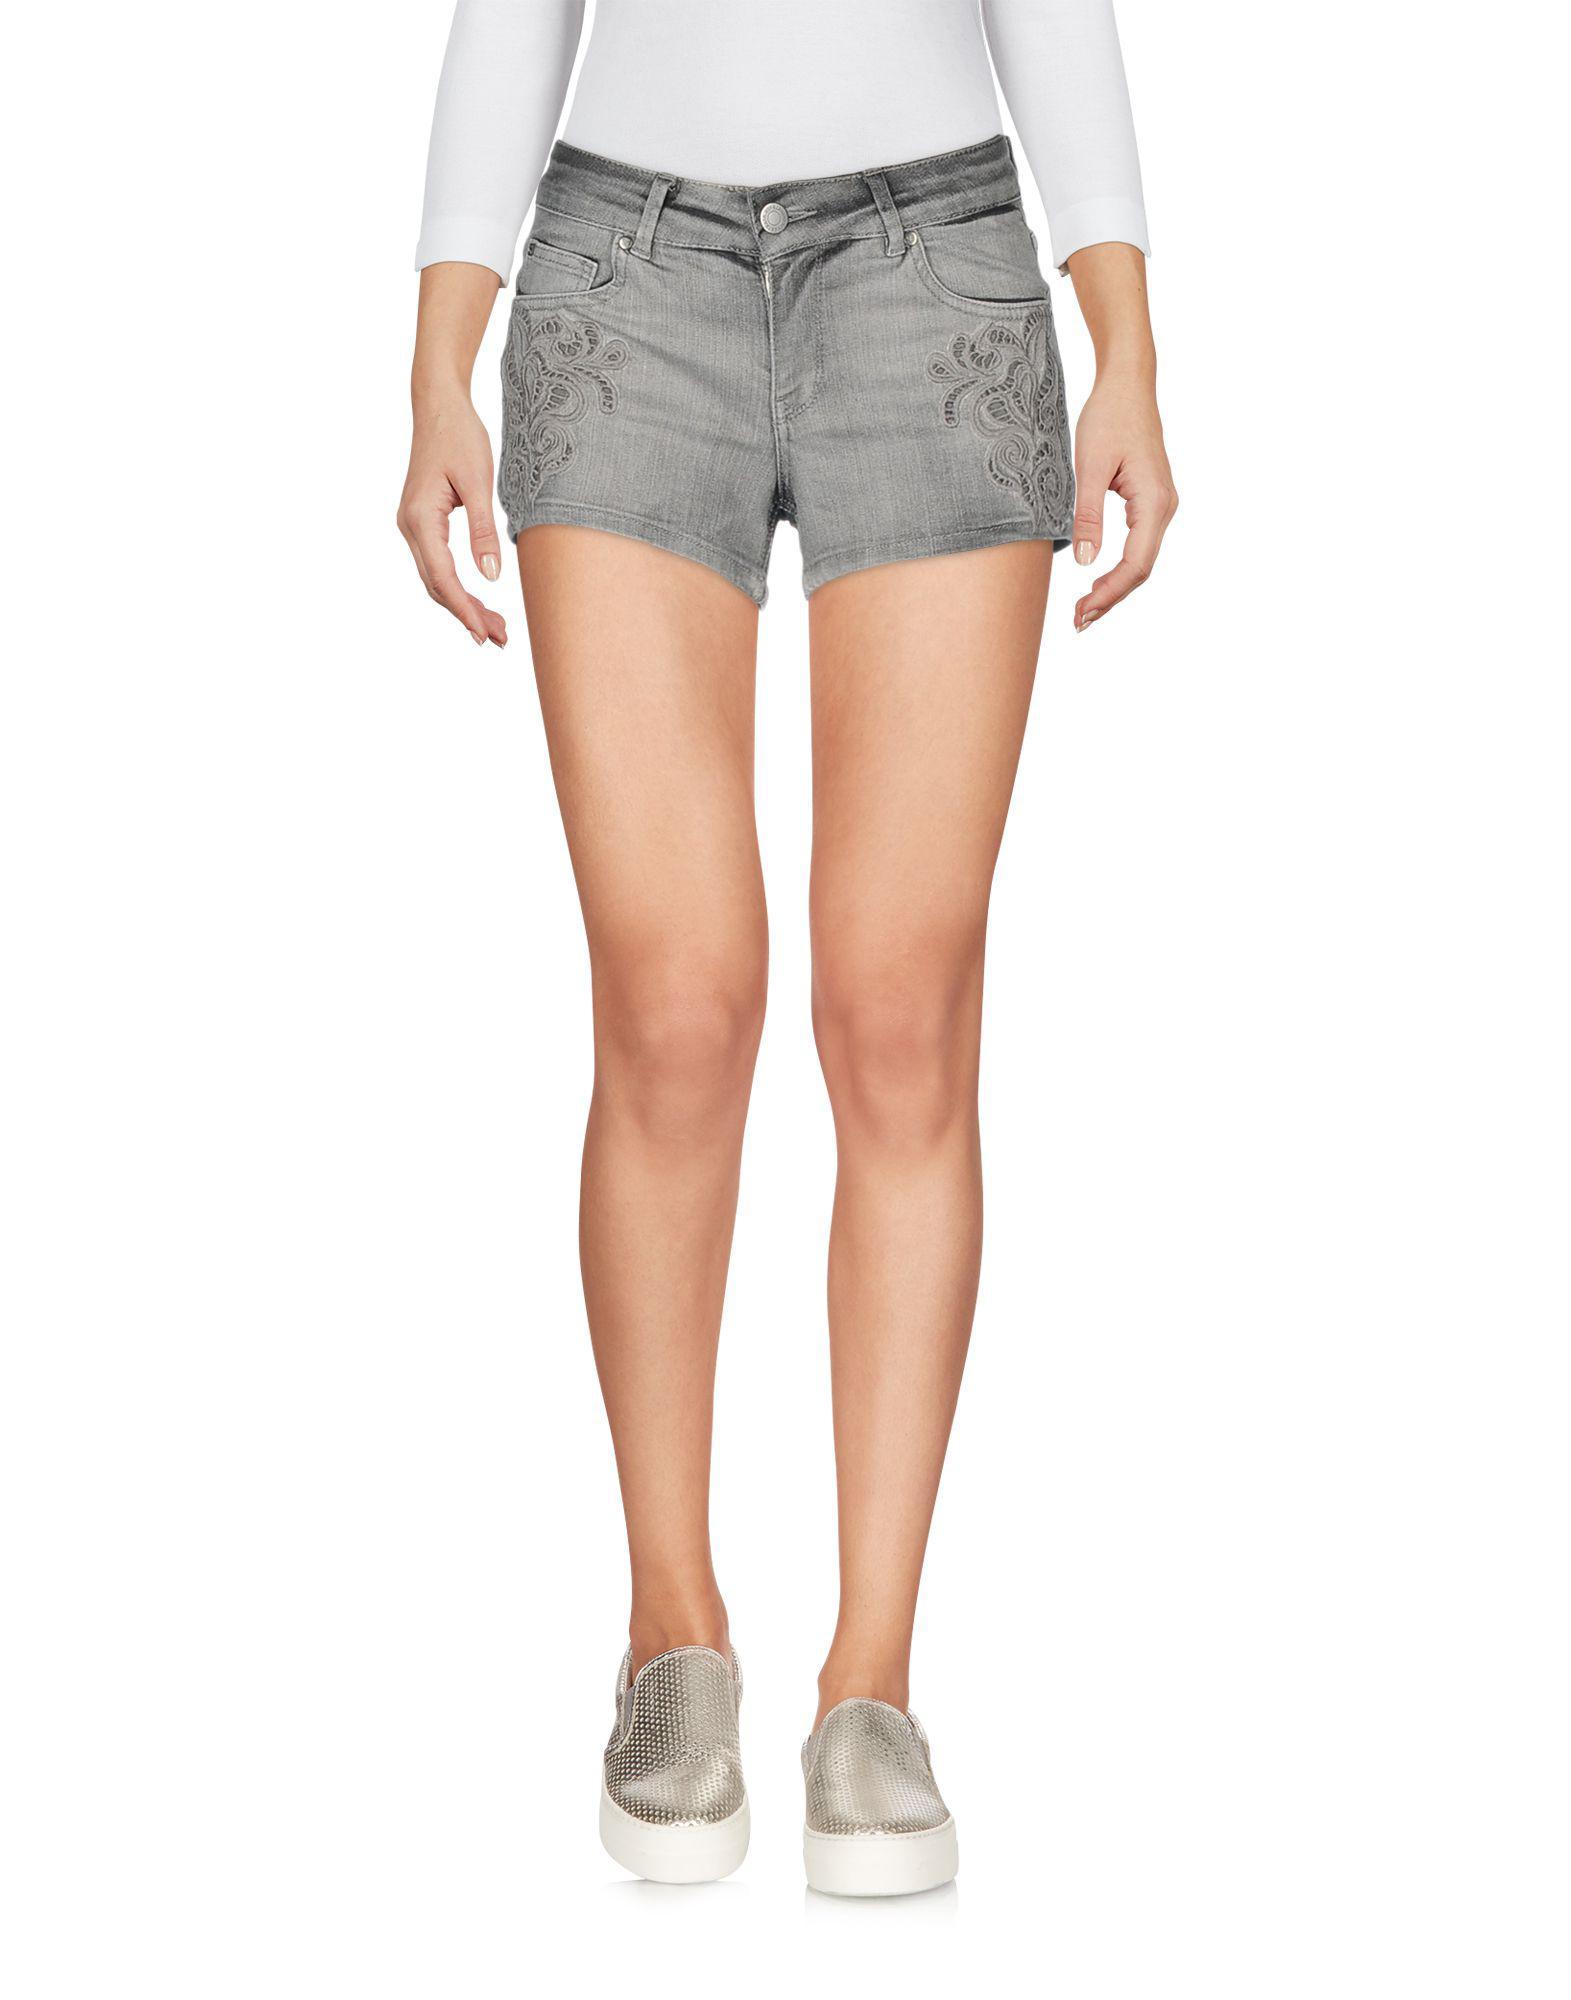 DENIM - Denim shorts Supertrash eVepMnX